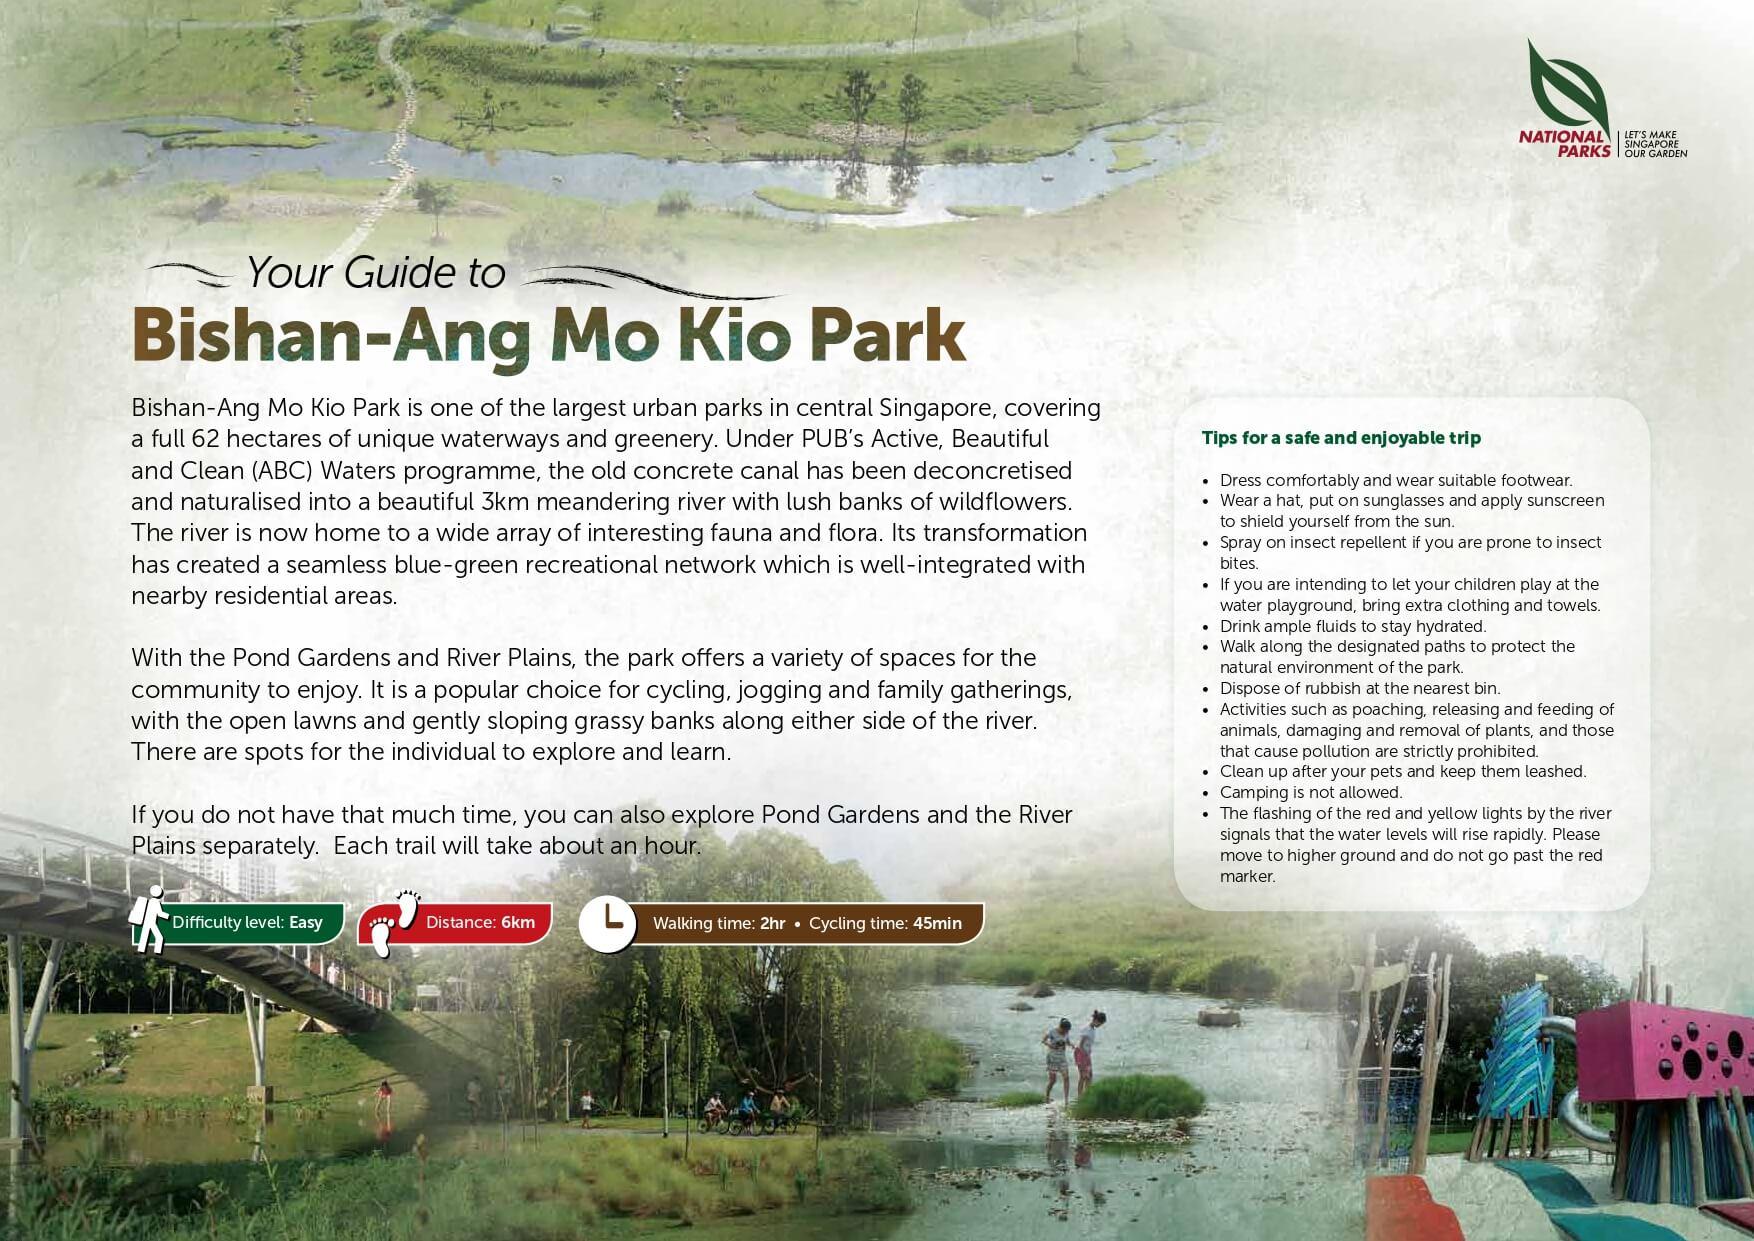 bishan amk park page 1